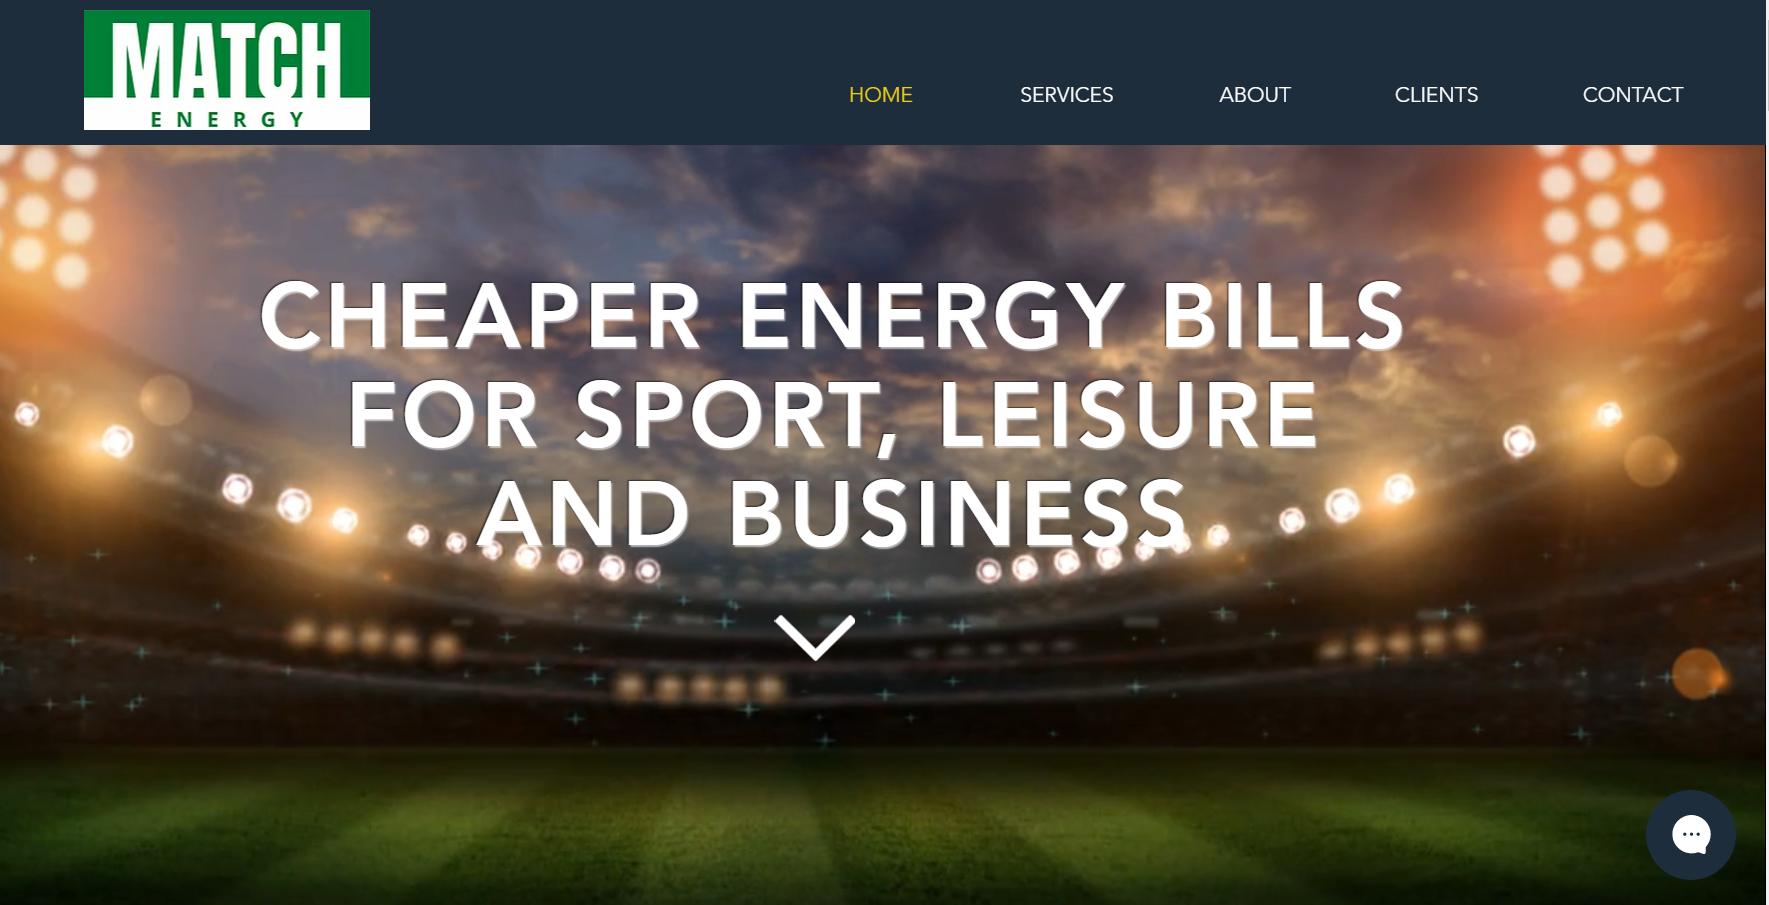 New Partners, Match Energy